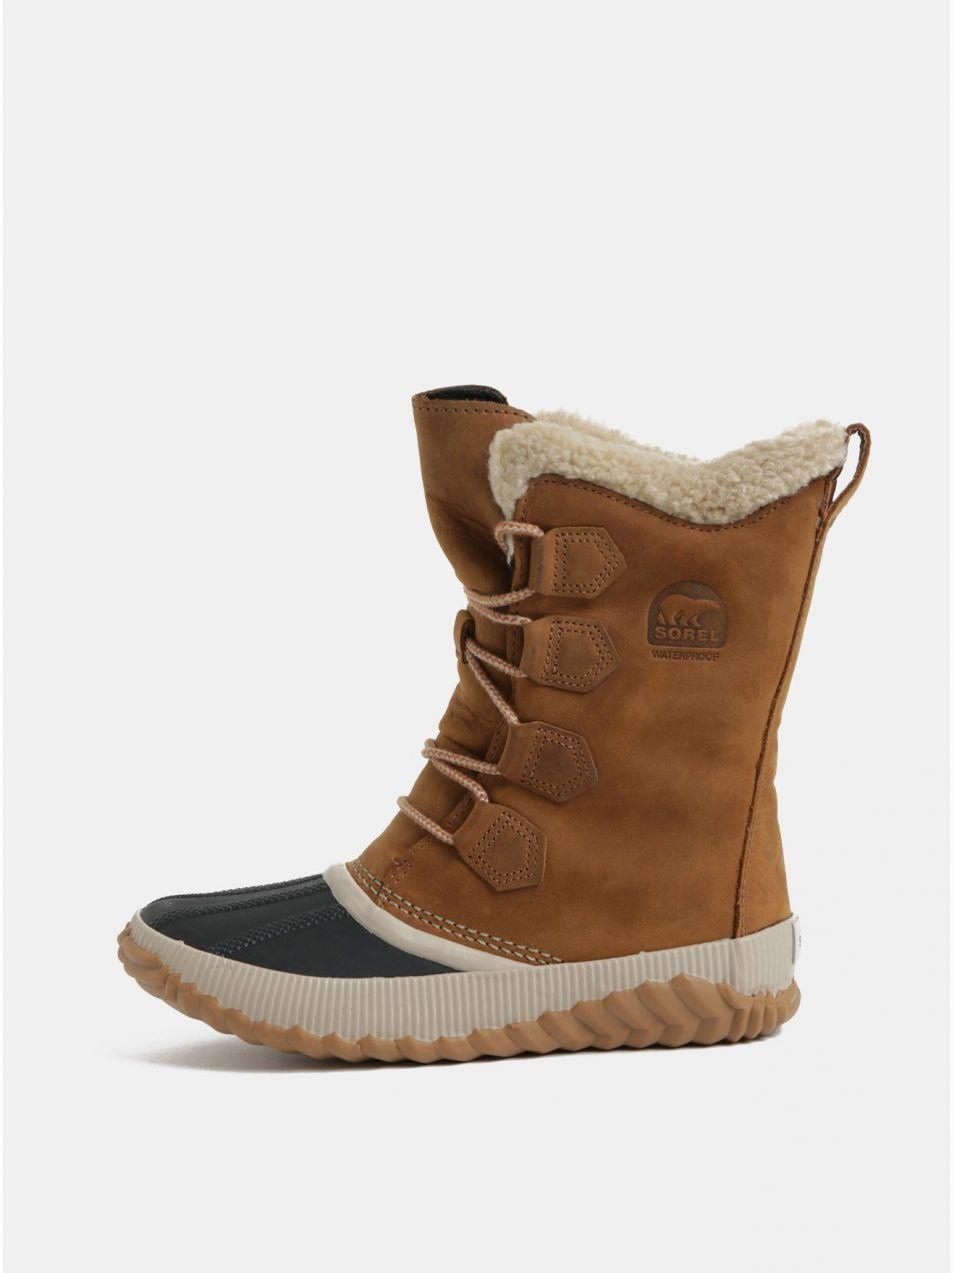 5c6f660b4a Hnedá dámske semišové nepremokavé zimné topánky SOREL Newbie značky SOREL -  Lovely.sk